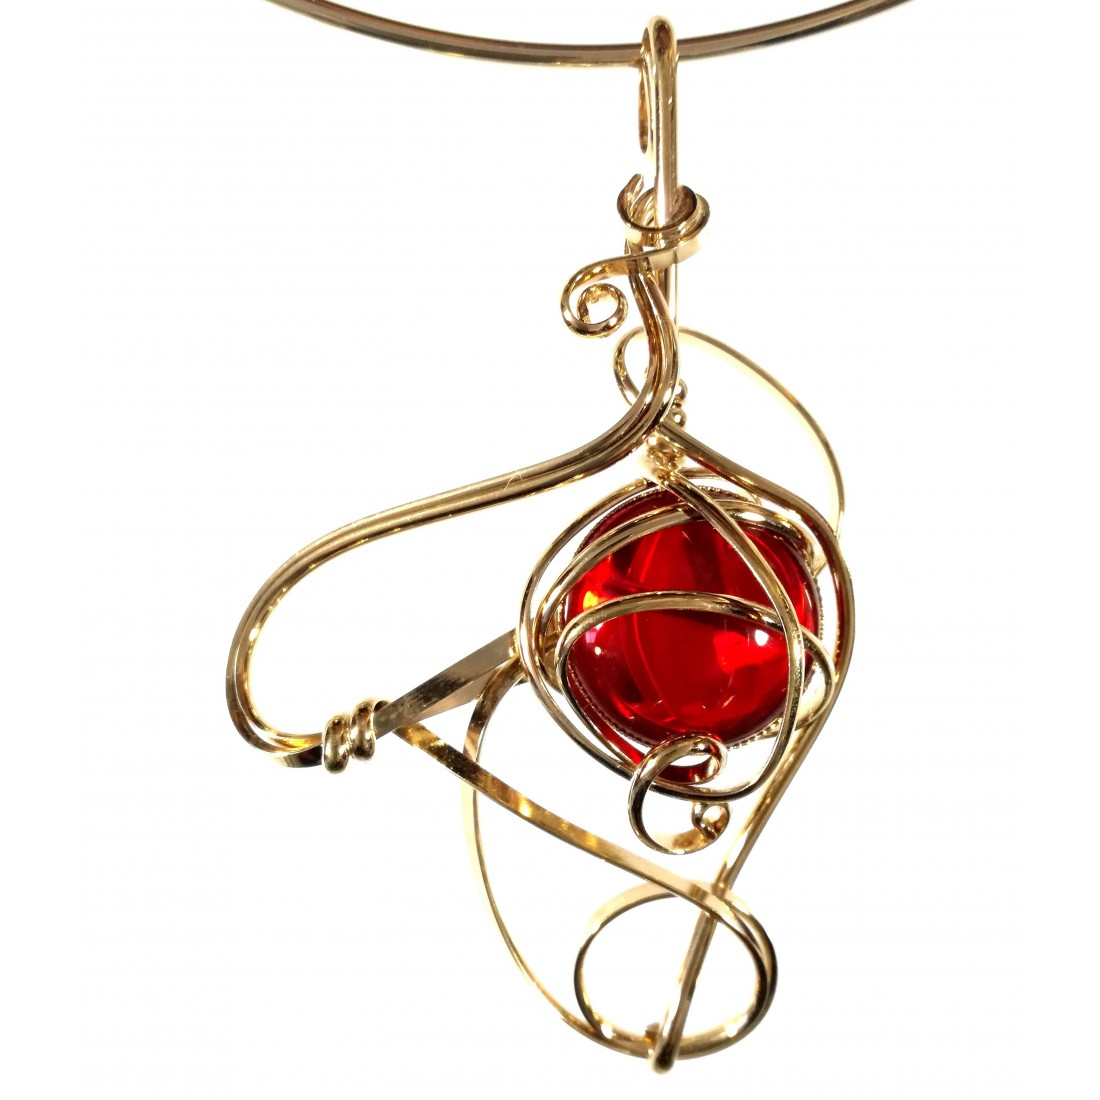 Bijou artisanal, collier or et rouge rubis